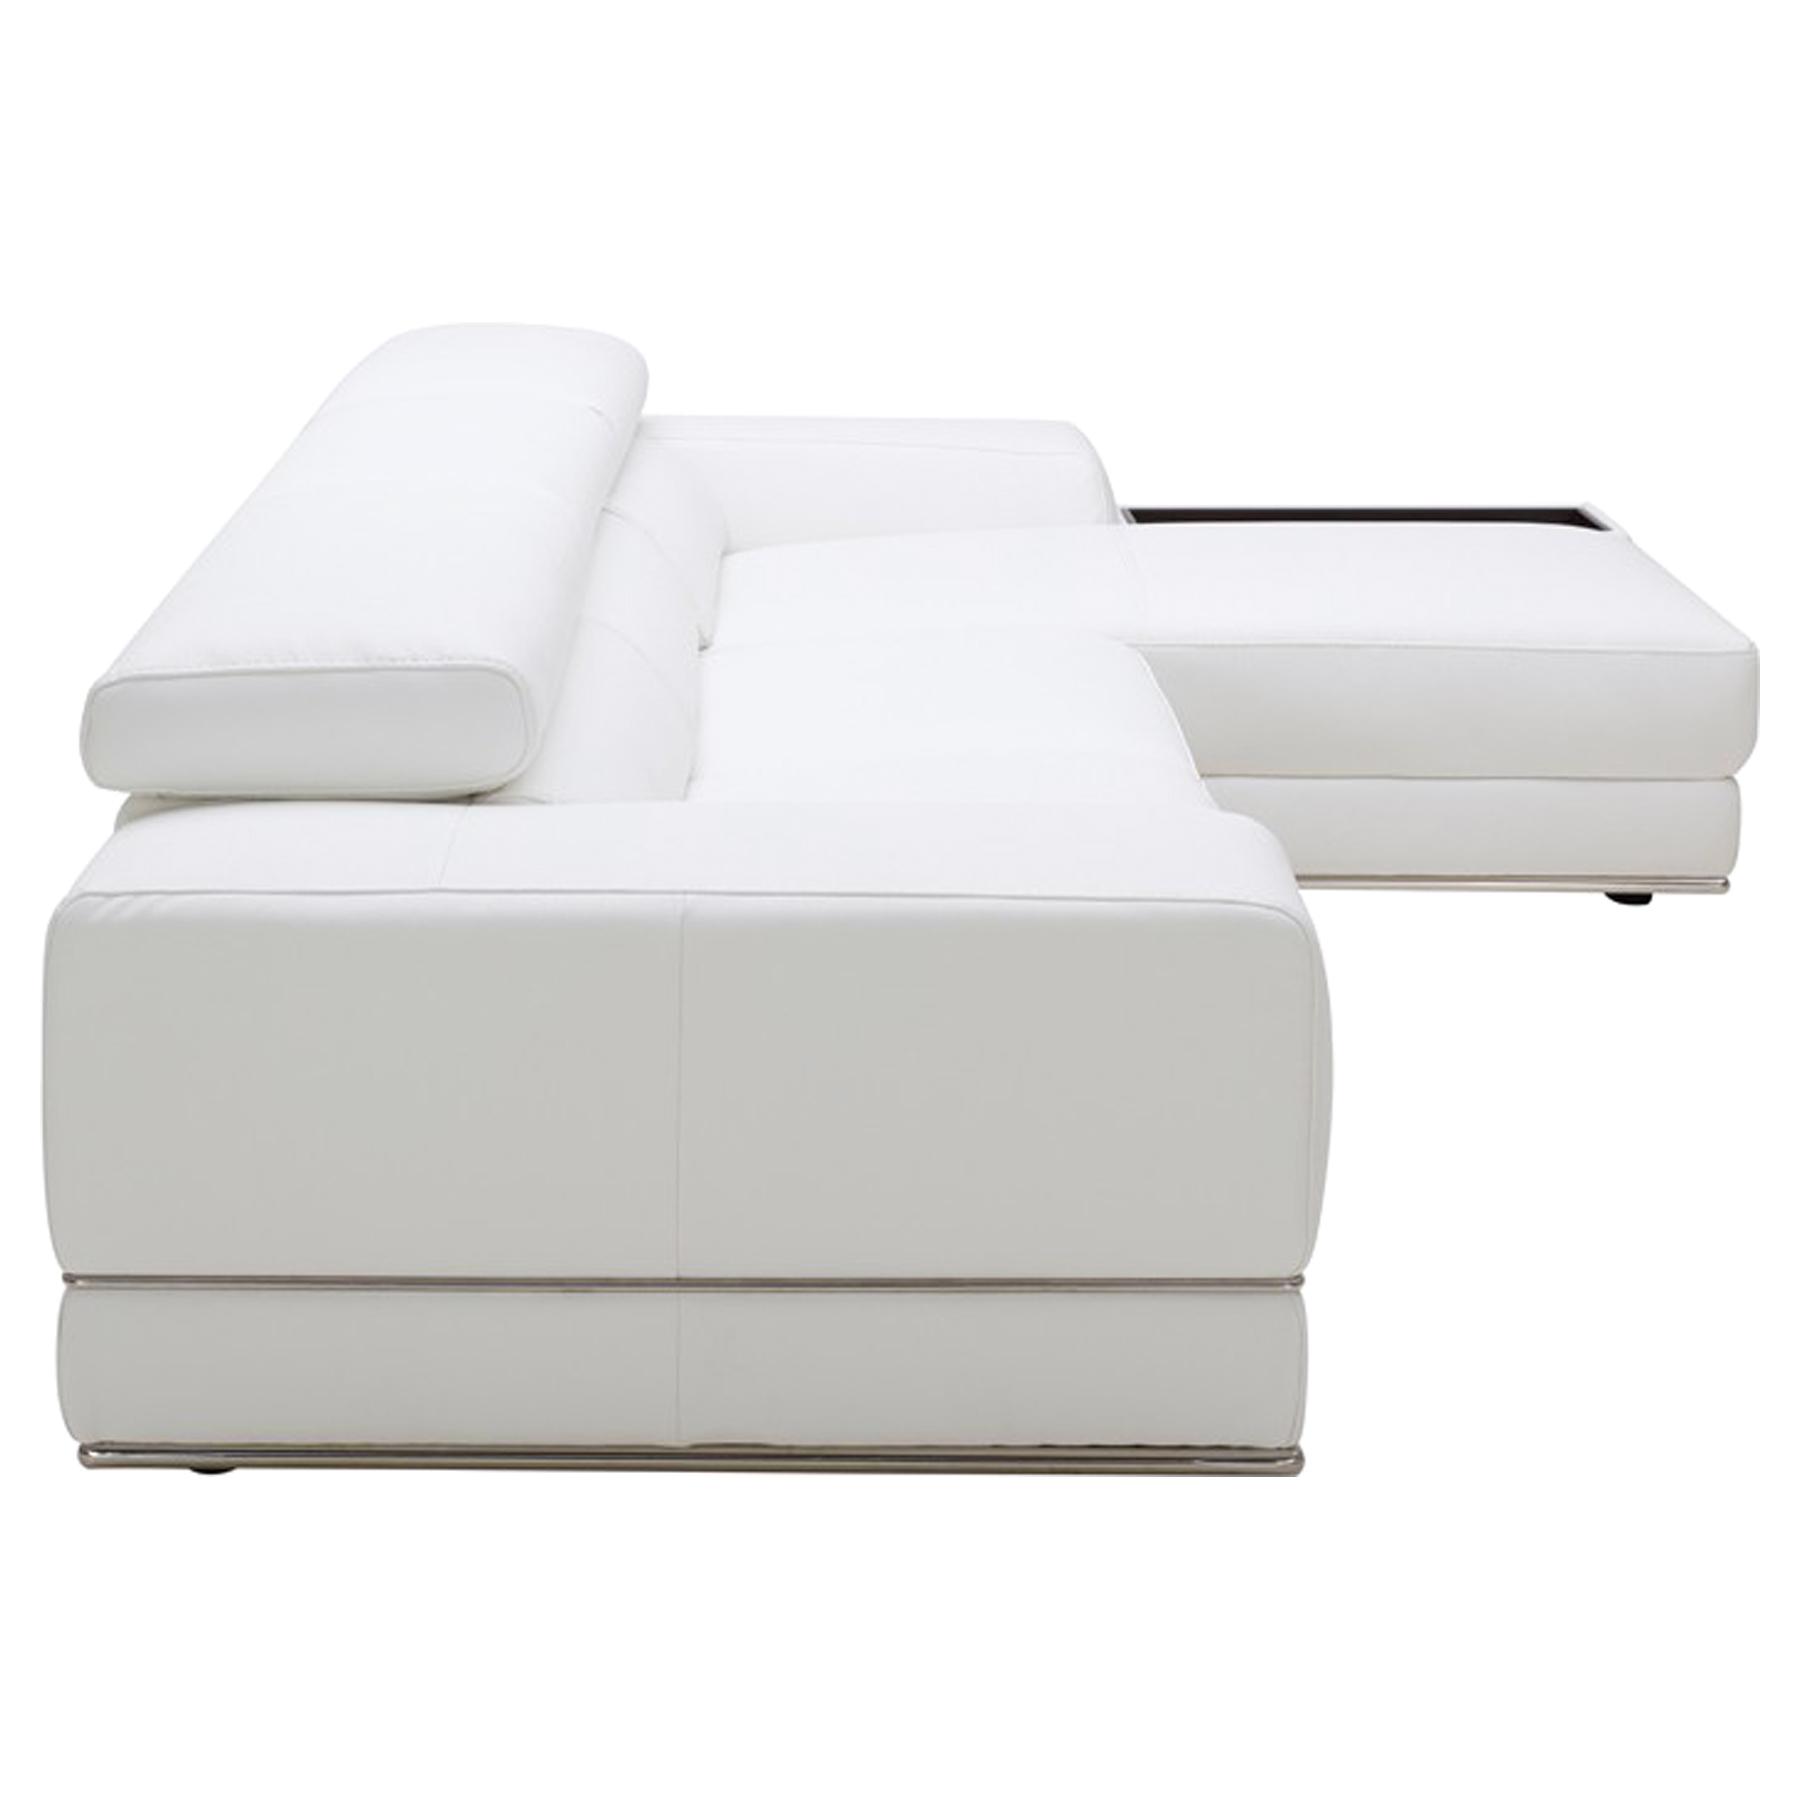 ... Divani Casa Chrysanthemum Mini Sectional Sofa   White   VIG VGKK1576  MINI ECO ...